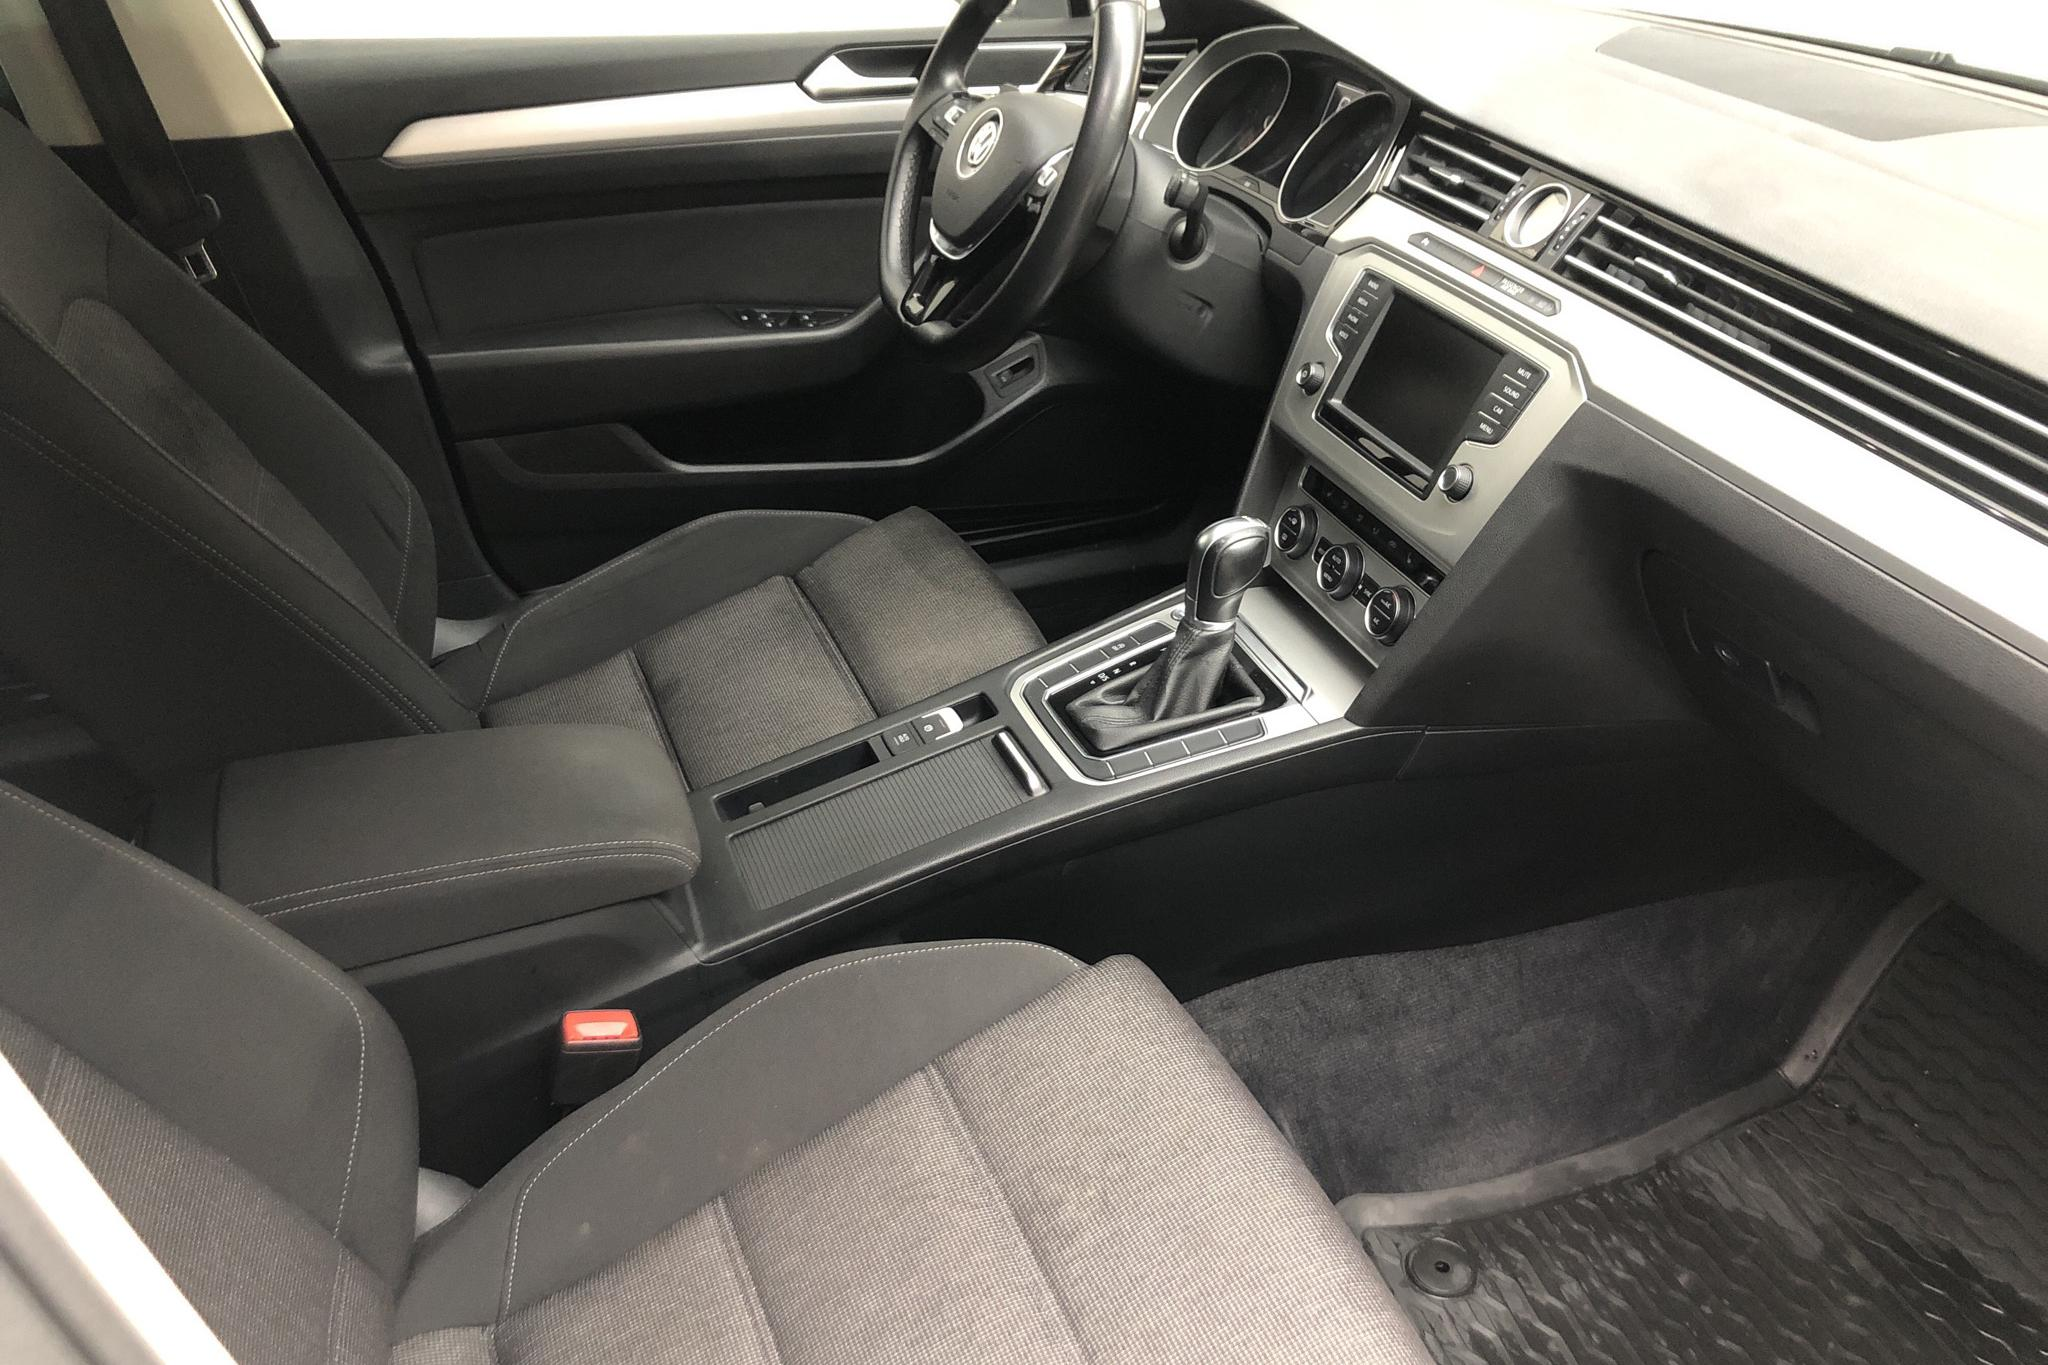 VW Passat 2.0 TDI Sportscombi (150hk) - 208 600 km - Automatic - white - 2016